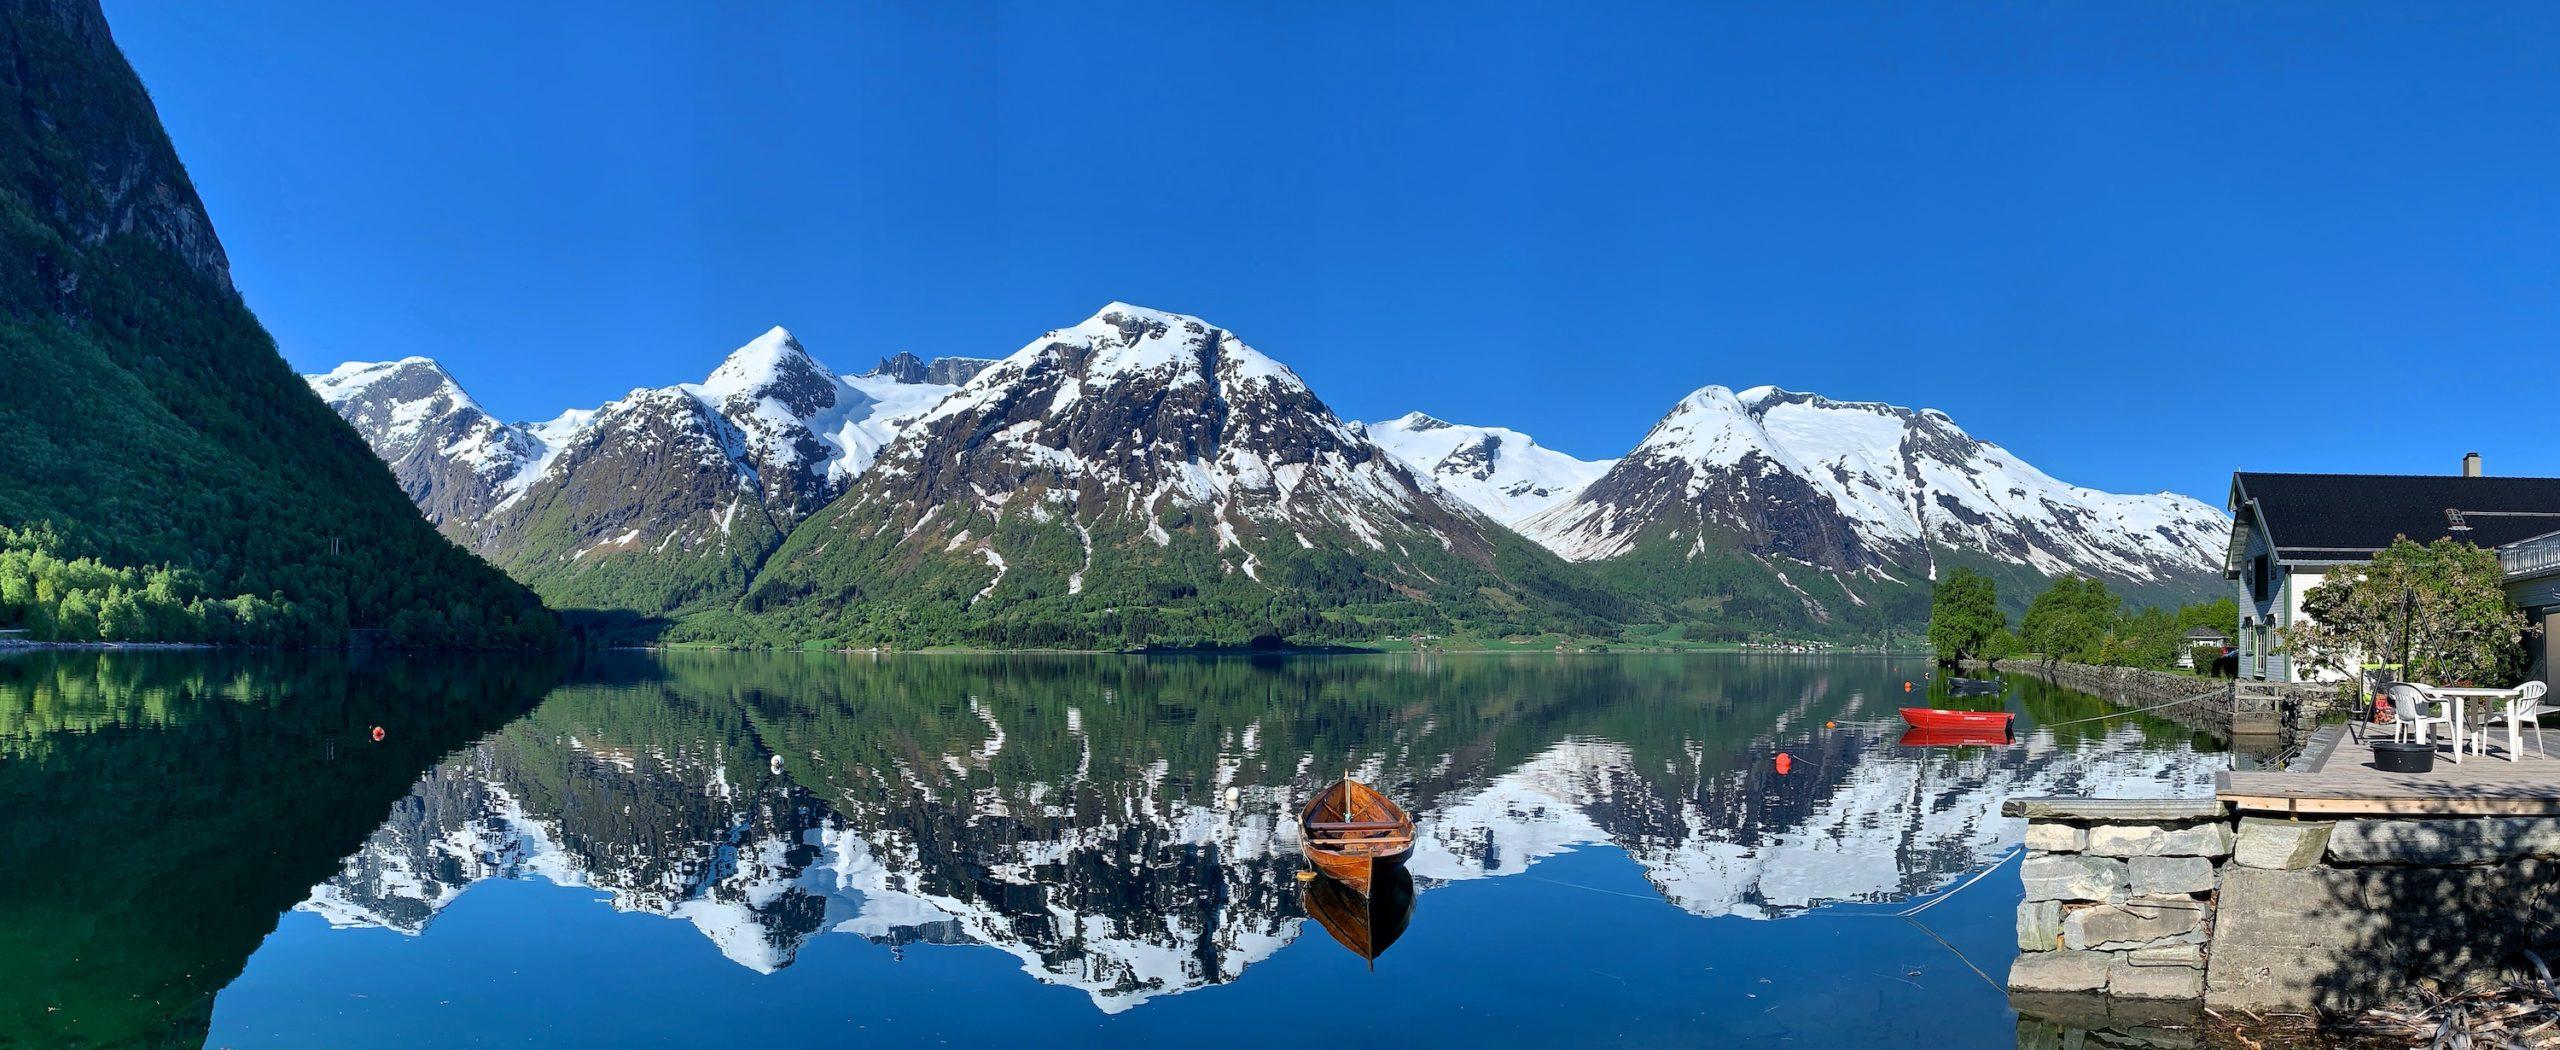 FJORDS NORGE - Hjelle i Oppstryn, mot Oppstrynsvatnet. Stryn i Nordfjord, Vestland.